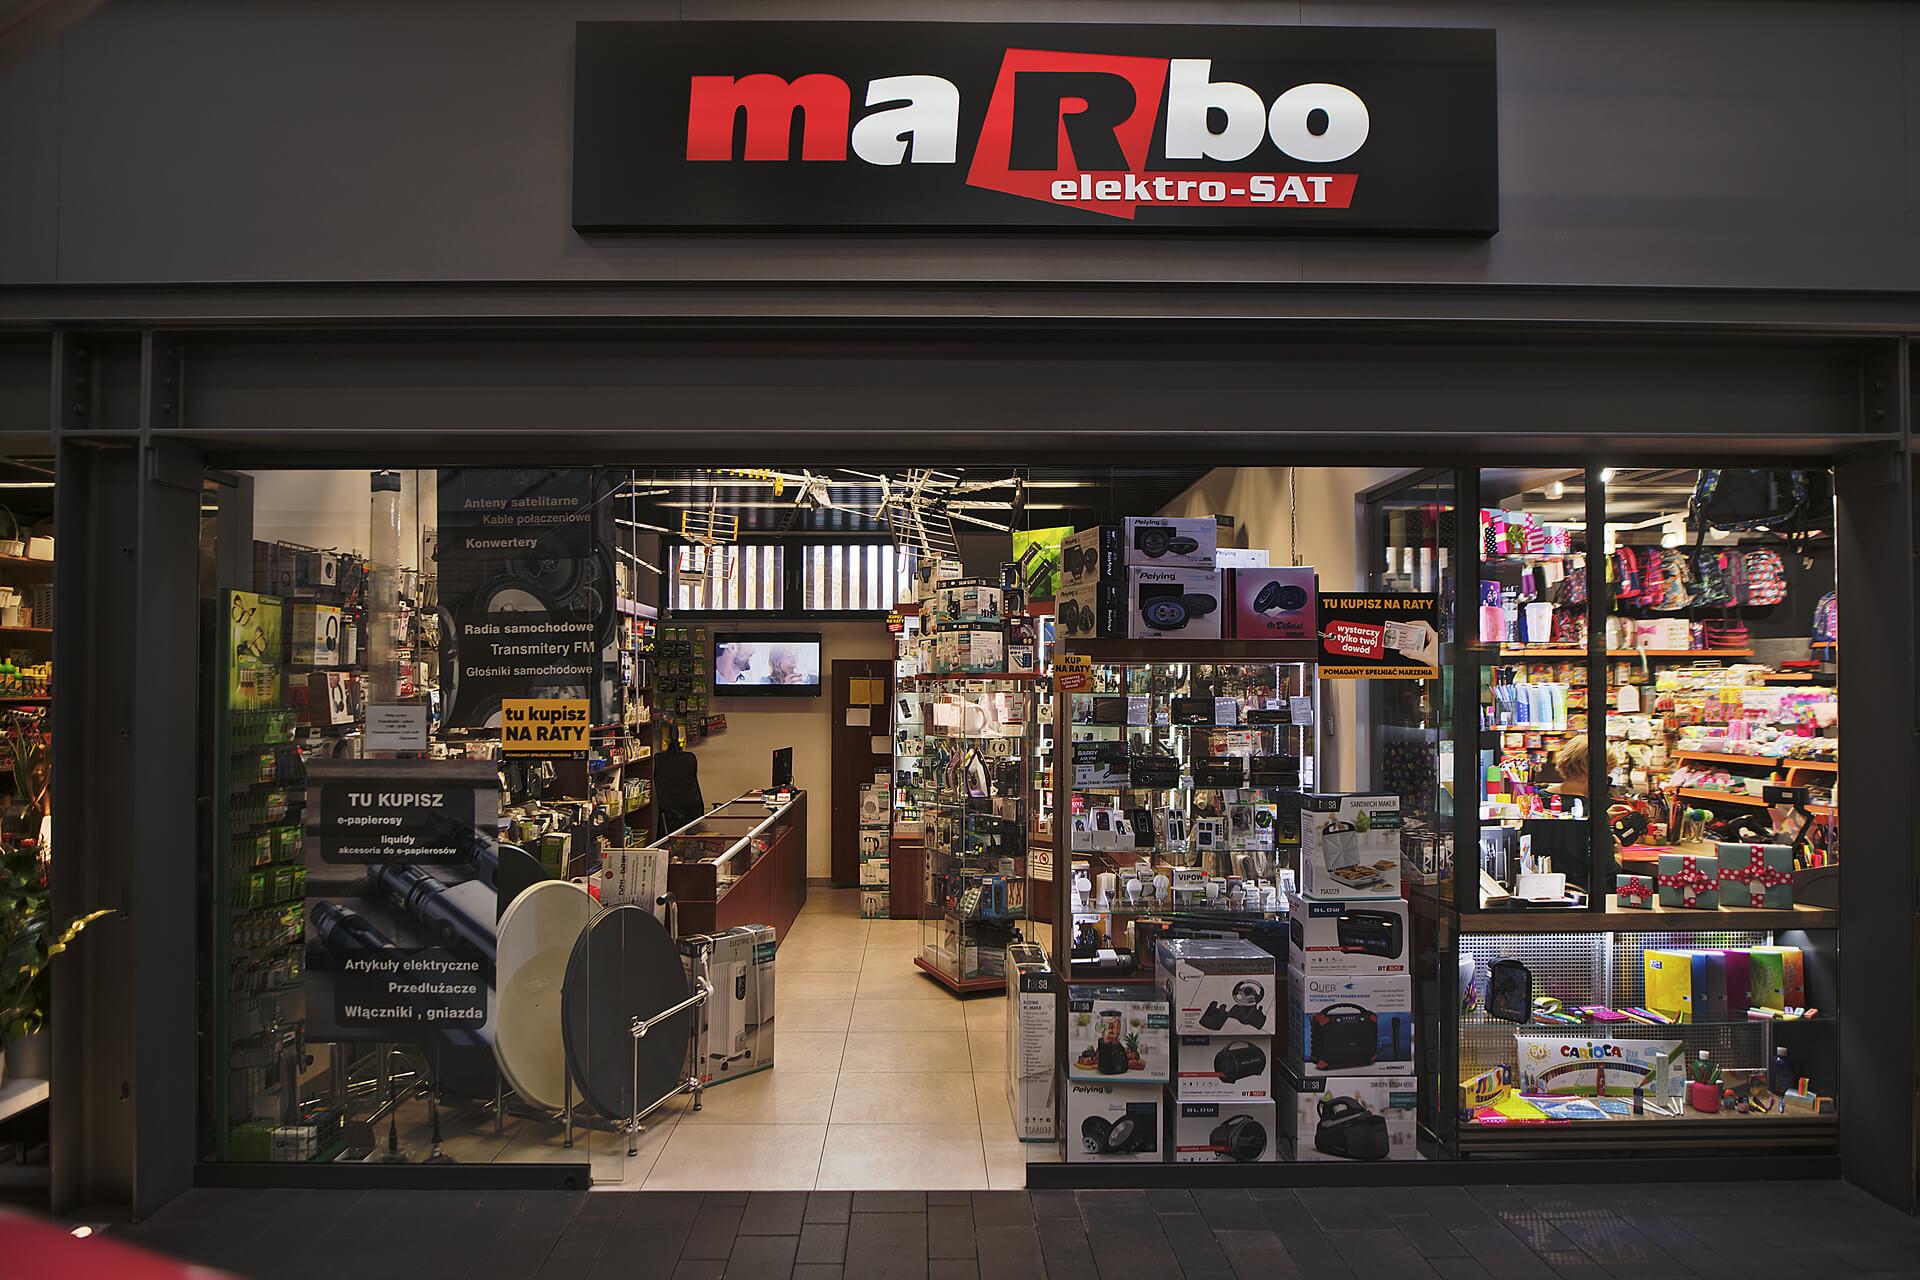 Marbo Elektro-Sat